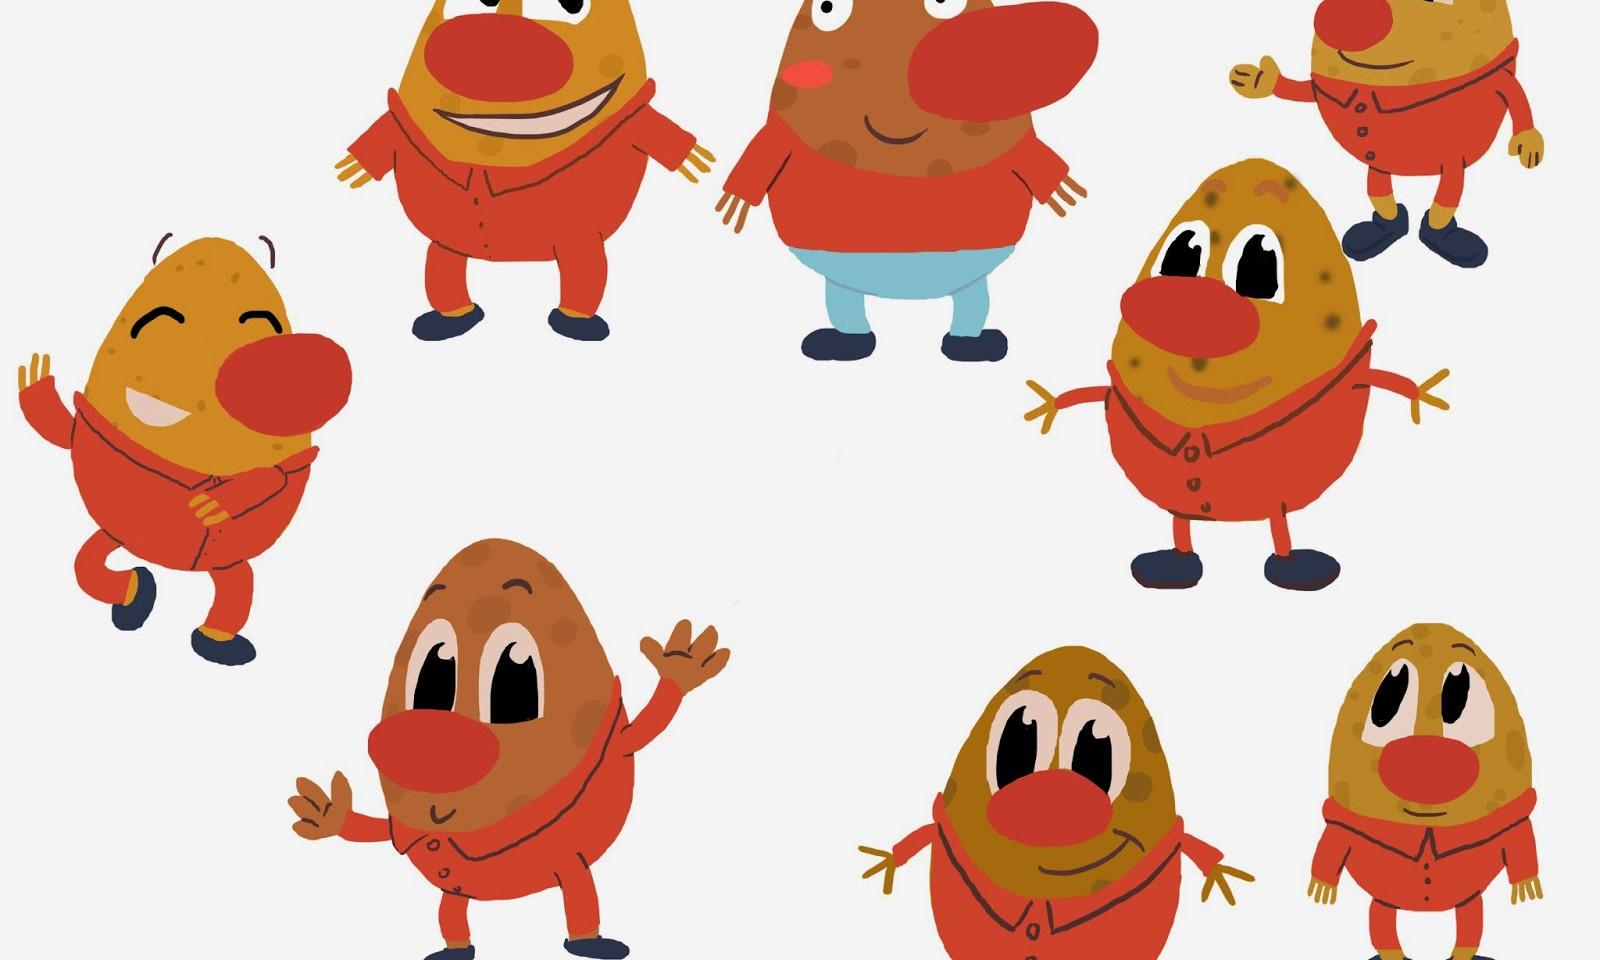 Potato Concept